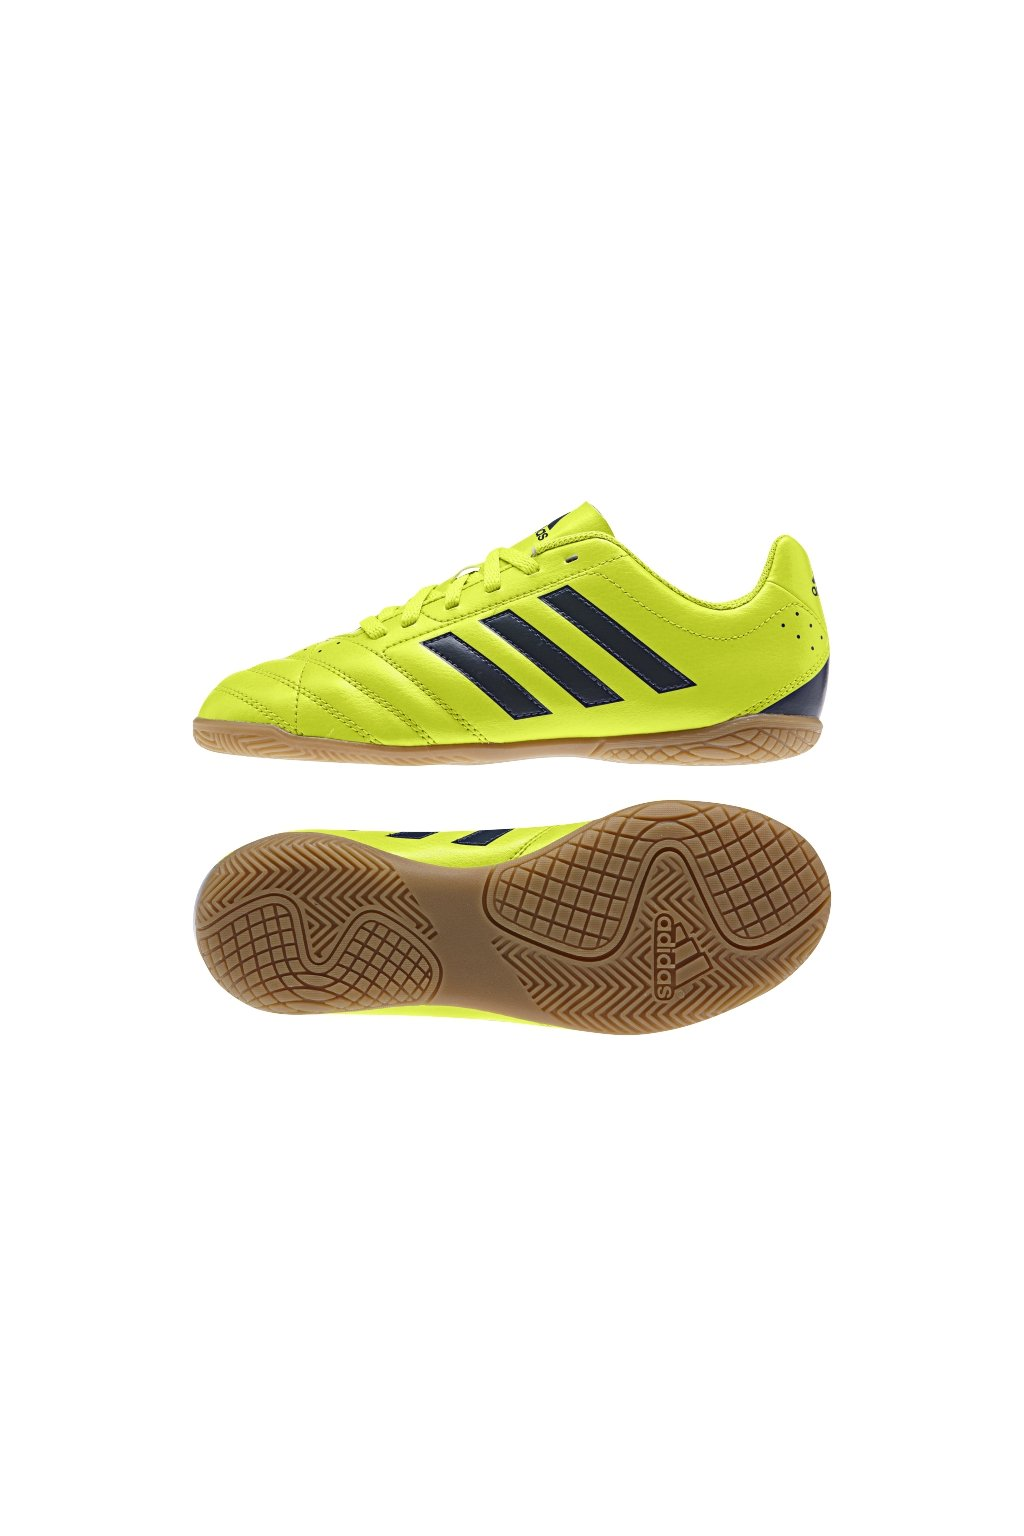 detske_halove_kopacky_adidas GOLETTO IN J B26187 -agilesport.sk